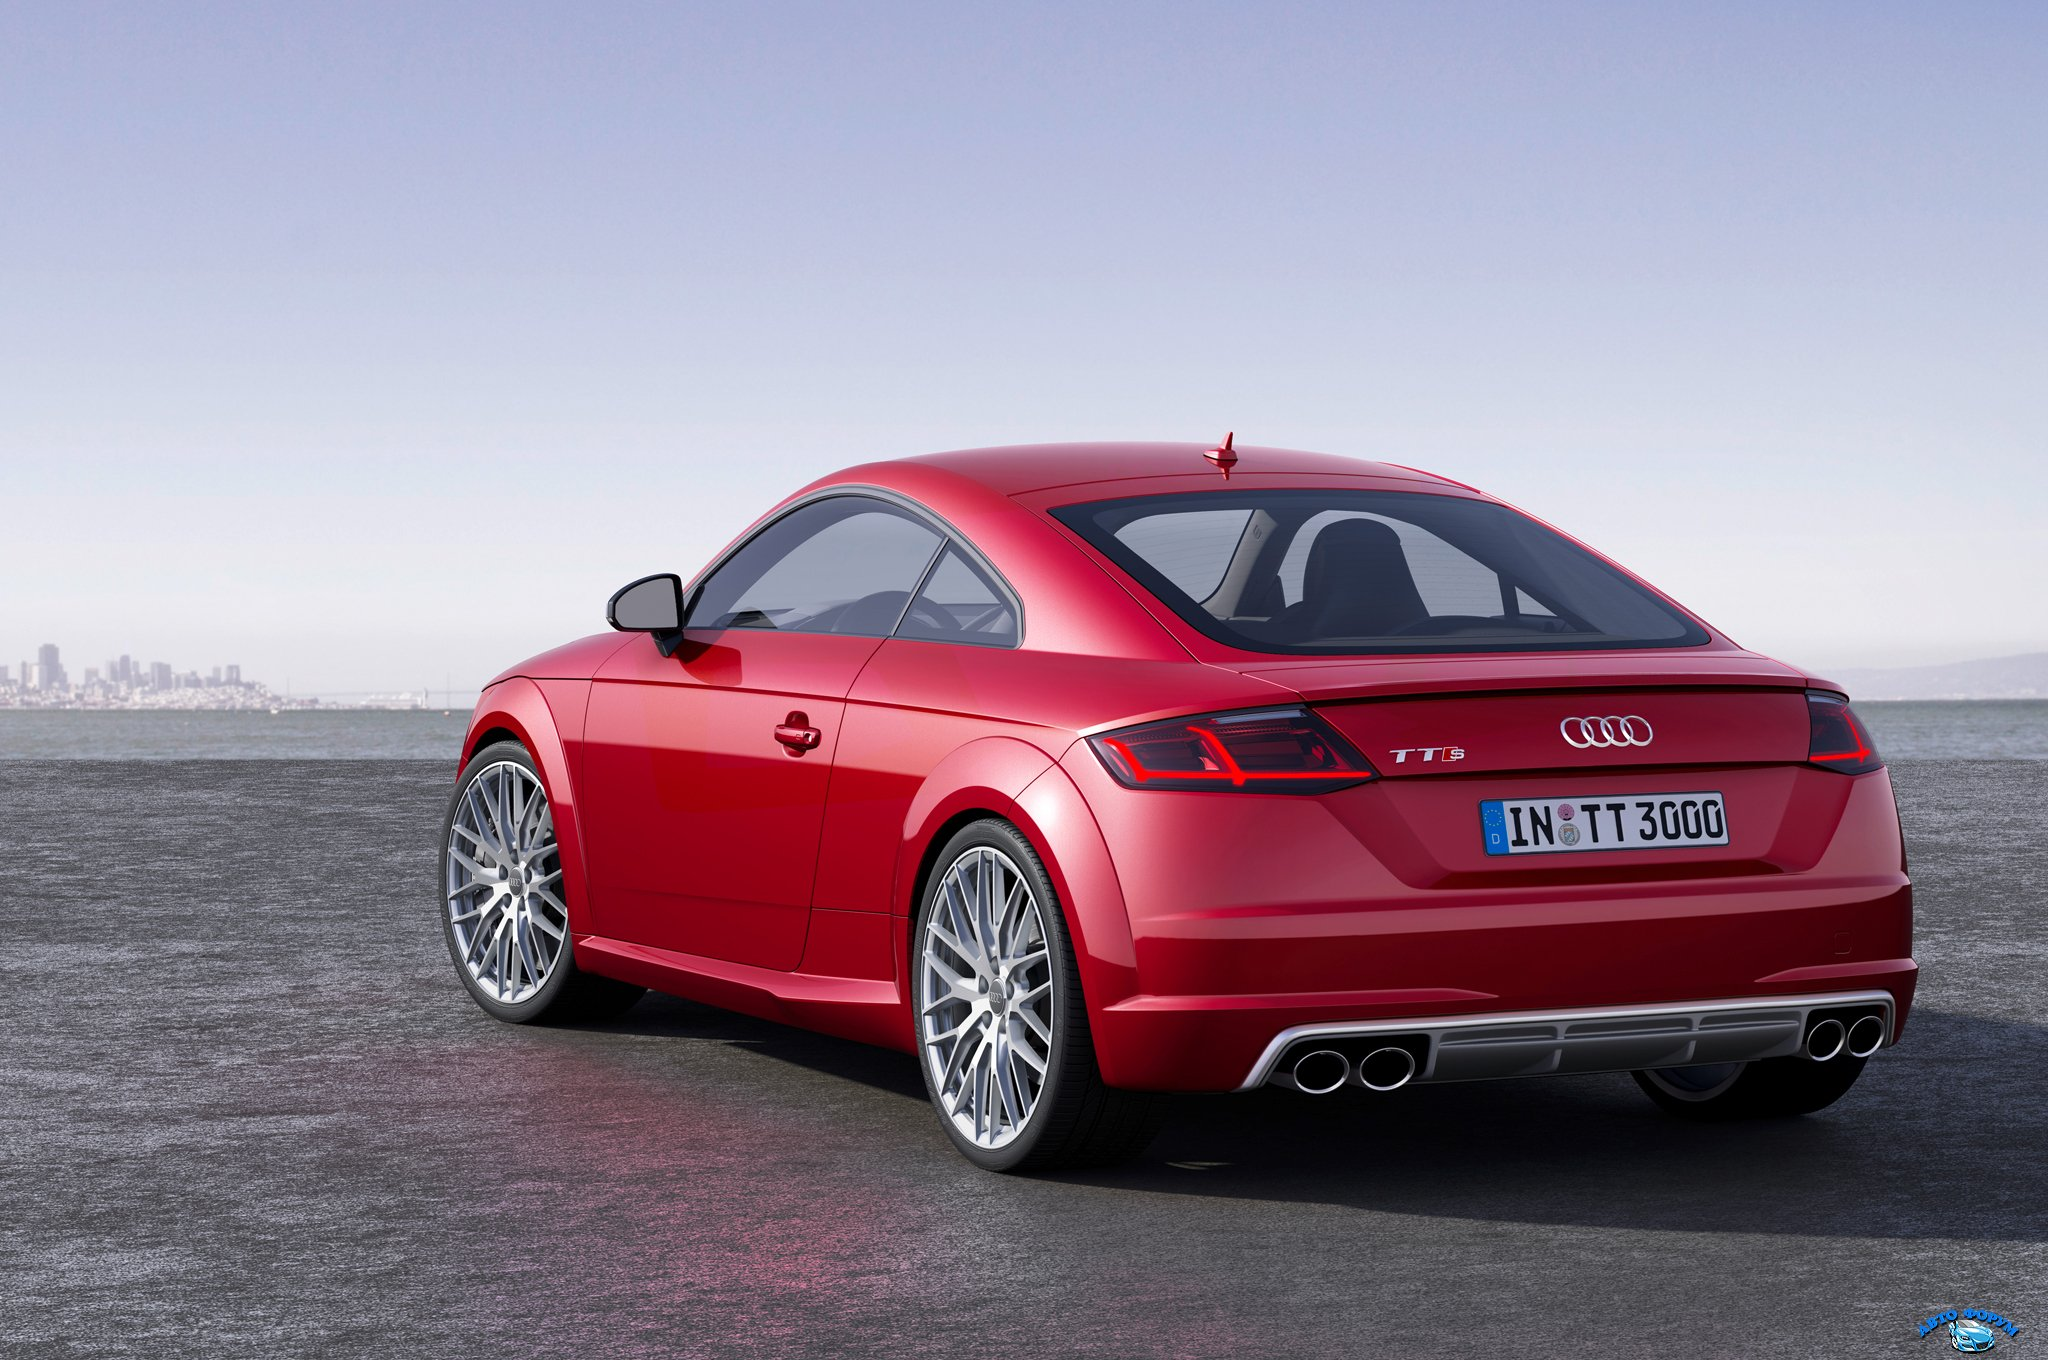 2016-Audi-TT-S-rear-three-quarter.jpg